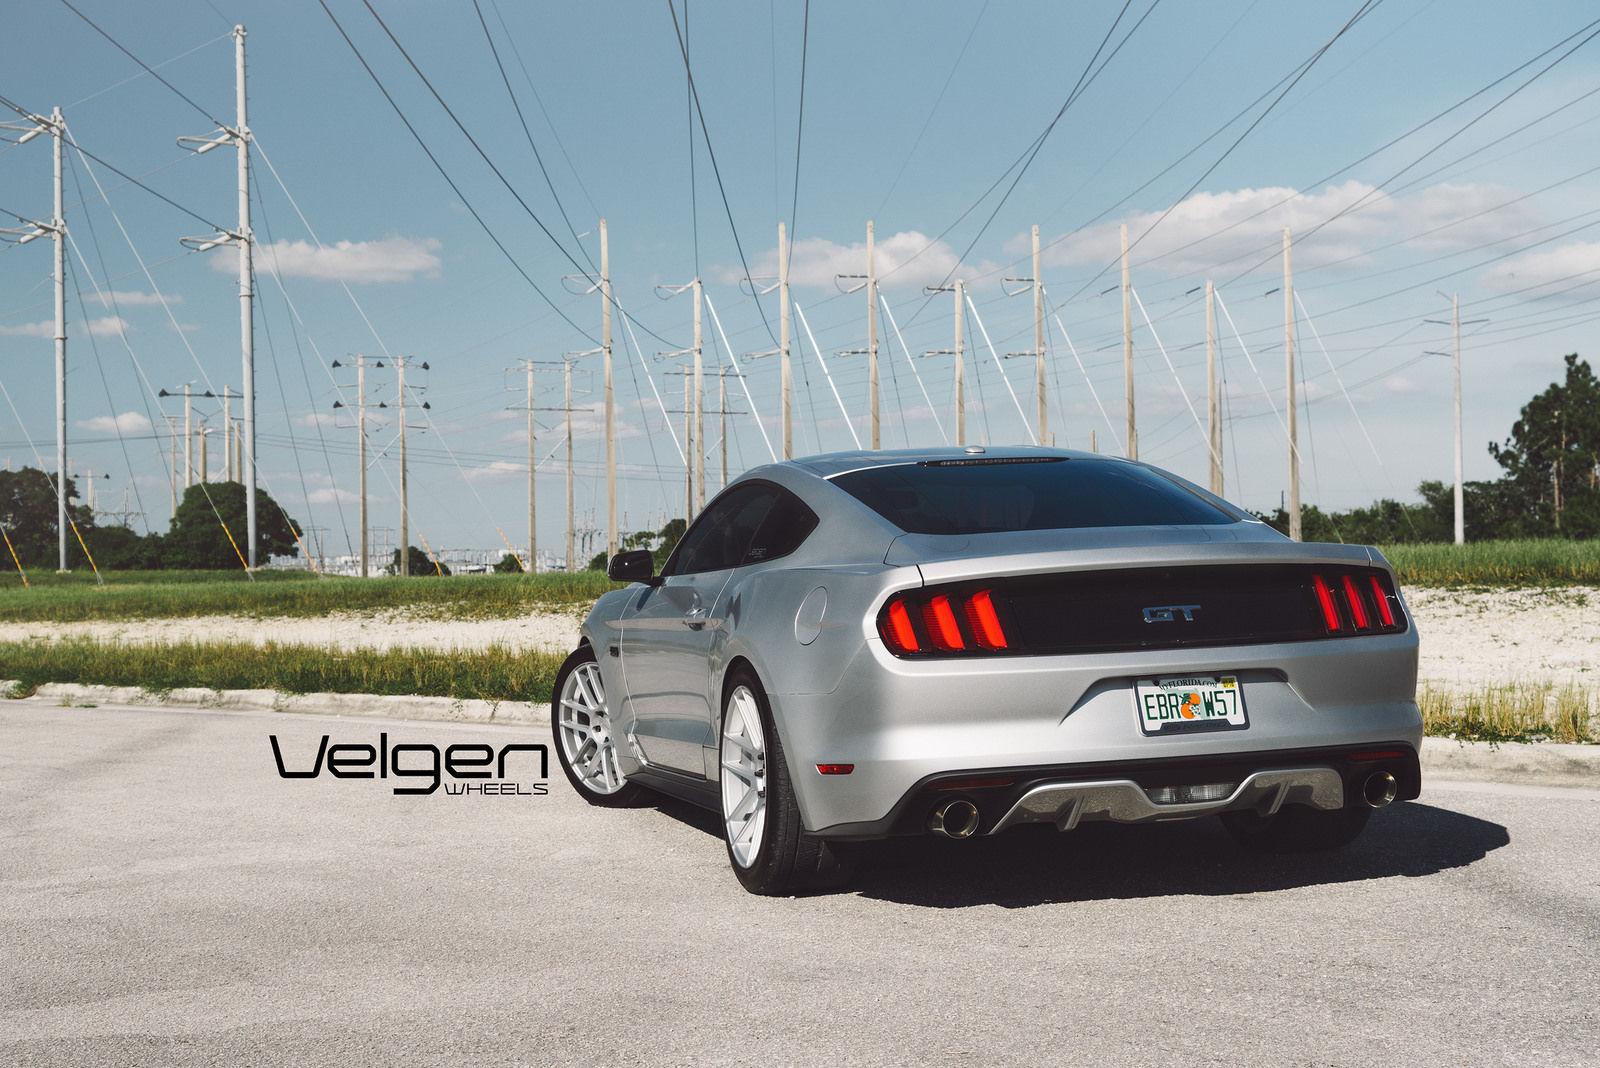 2015 Ford Mustang   2015 Ingot Silver Mustang GT on Velgen Wheels VMB6